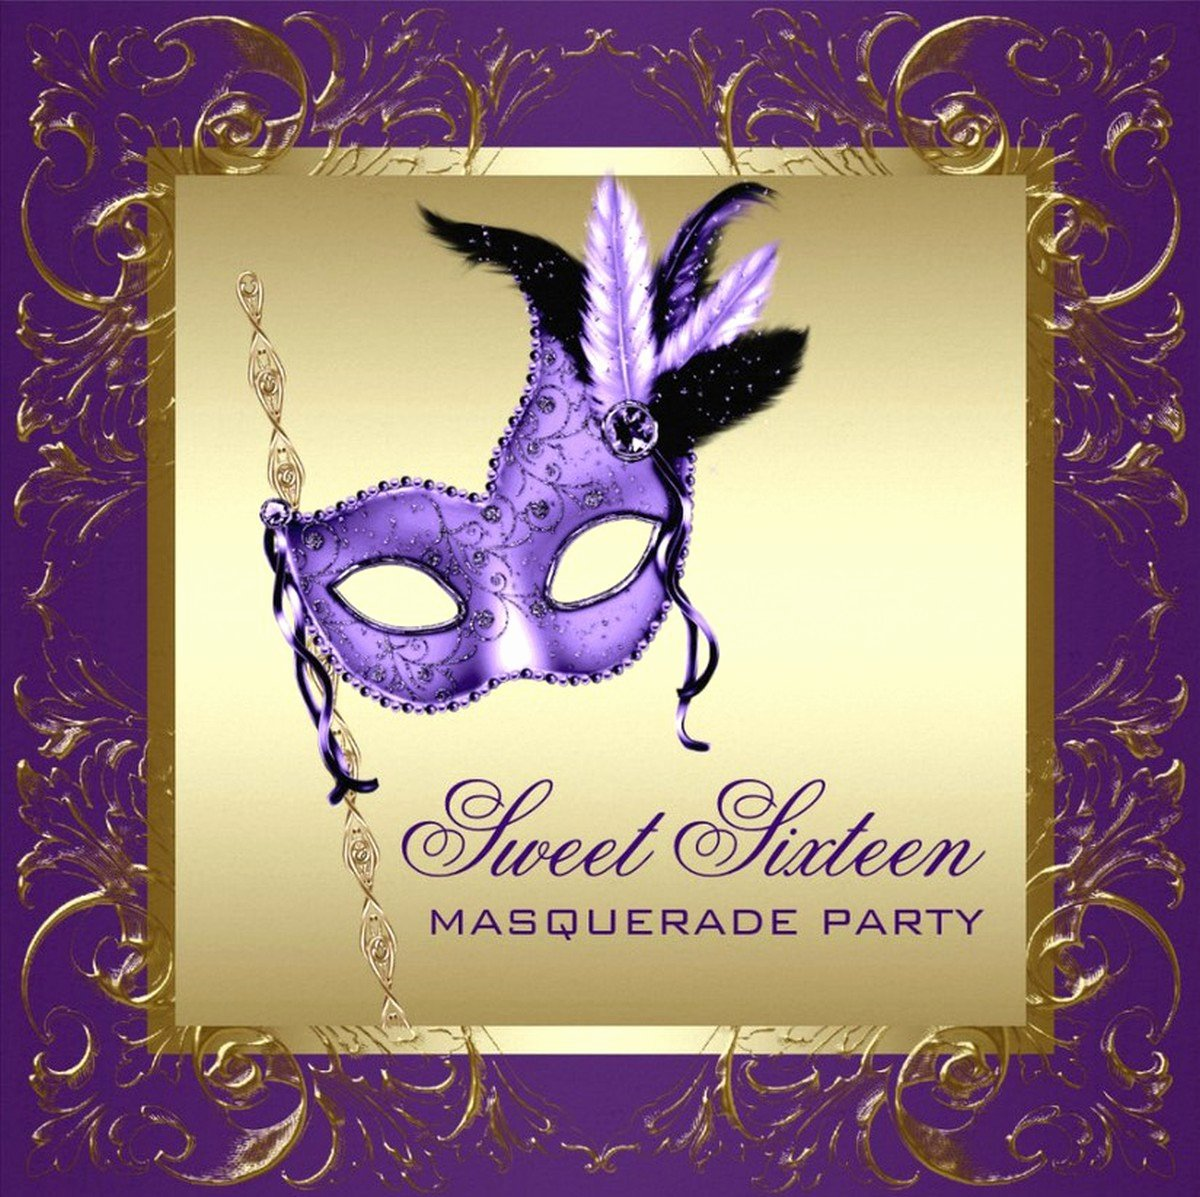 Masquerade Party Invitations Templates Free Beautiful Free Printable Masquerade Invitation Templates